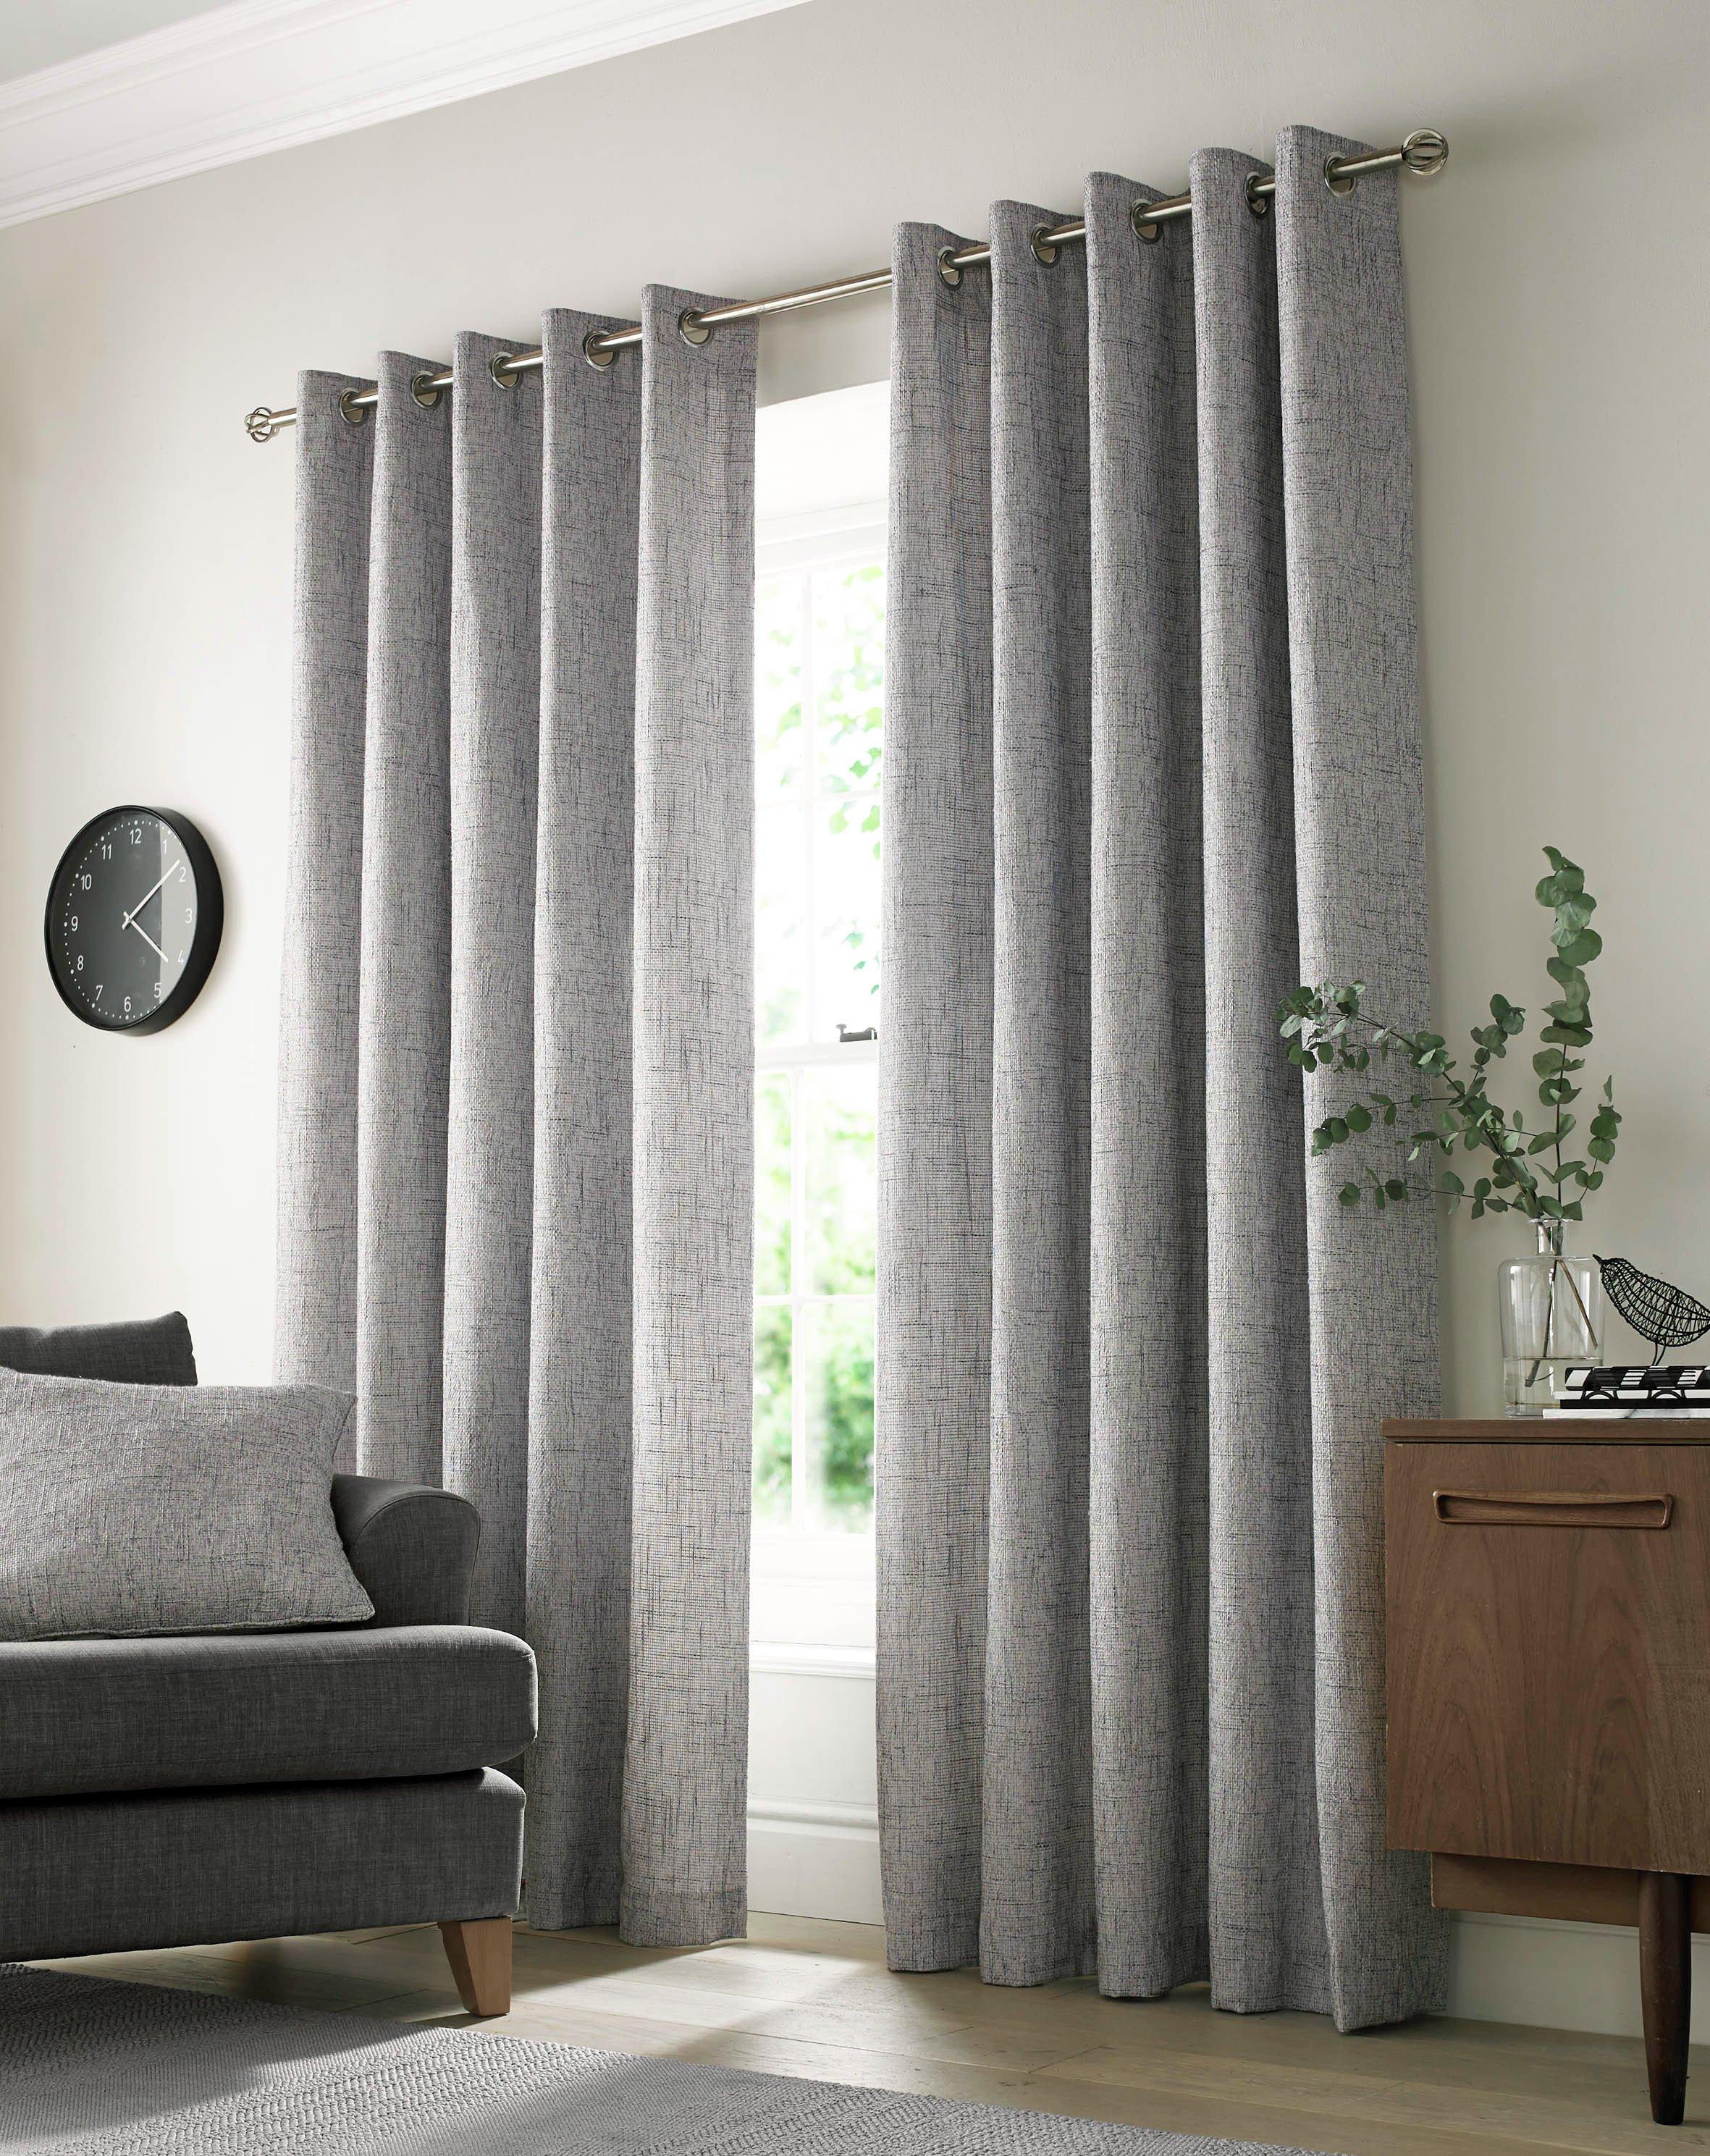 Academy Eyelet Curtains - 165x229cm - Grey.